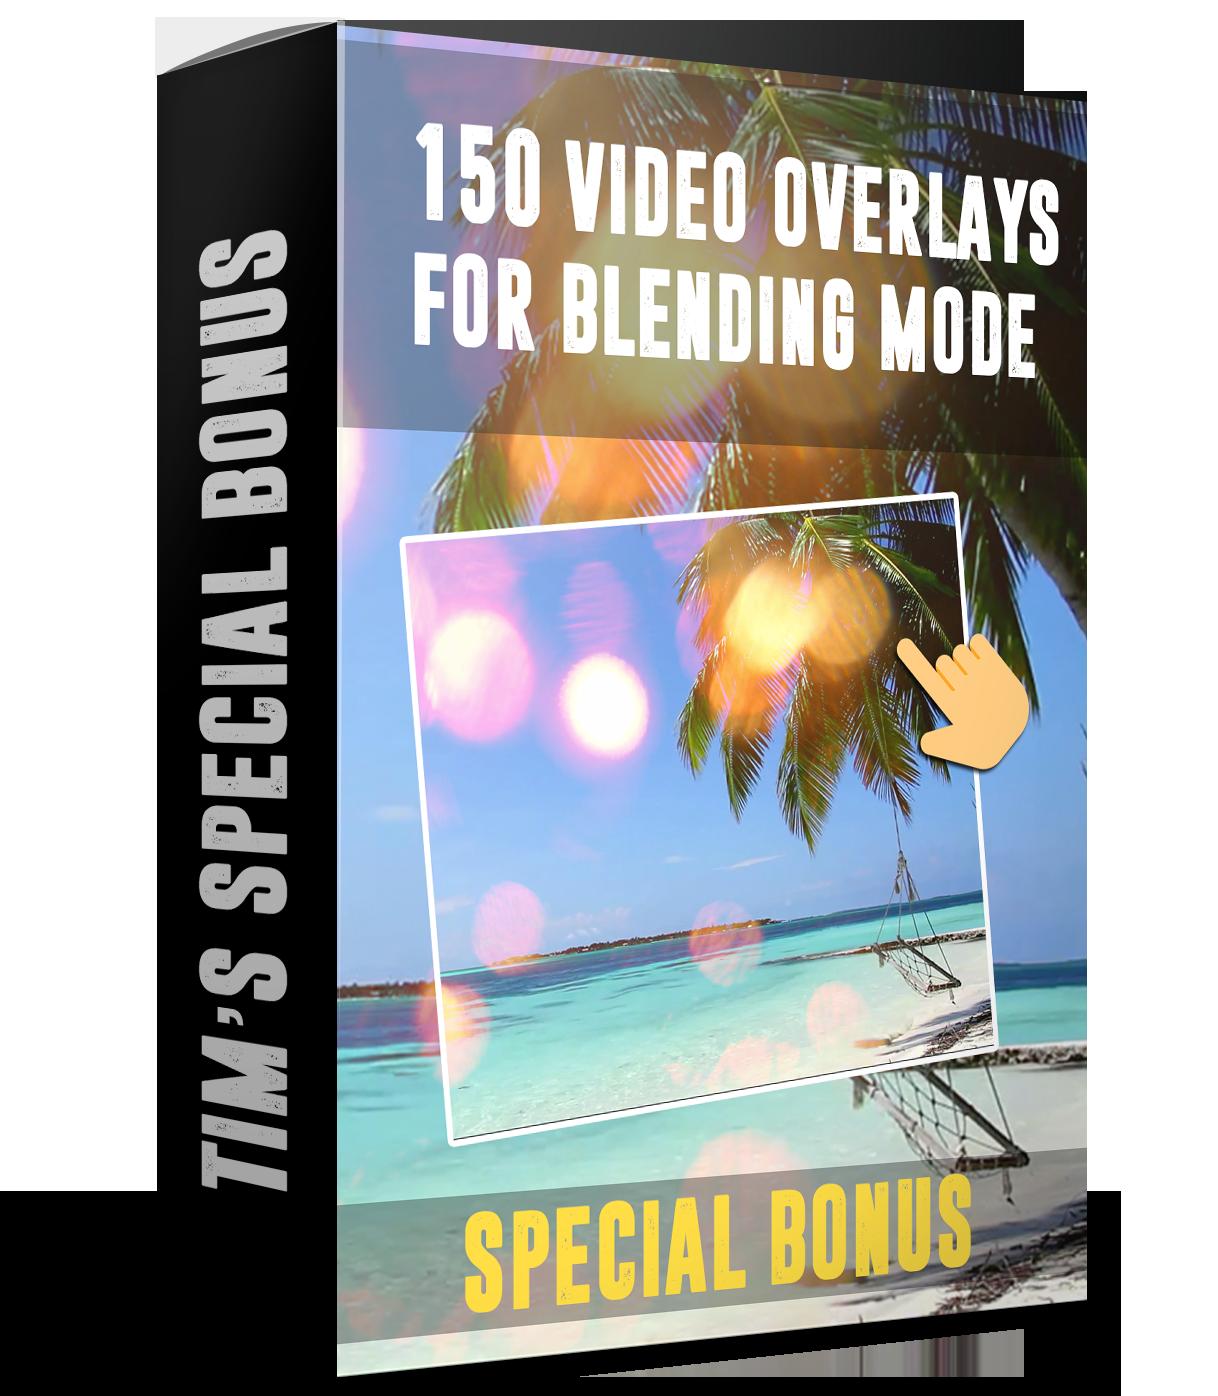 Smartvideo revolution bonus 2